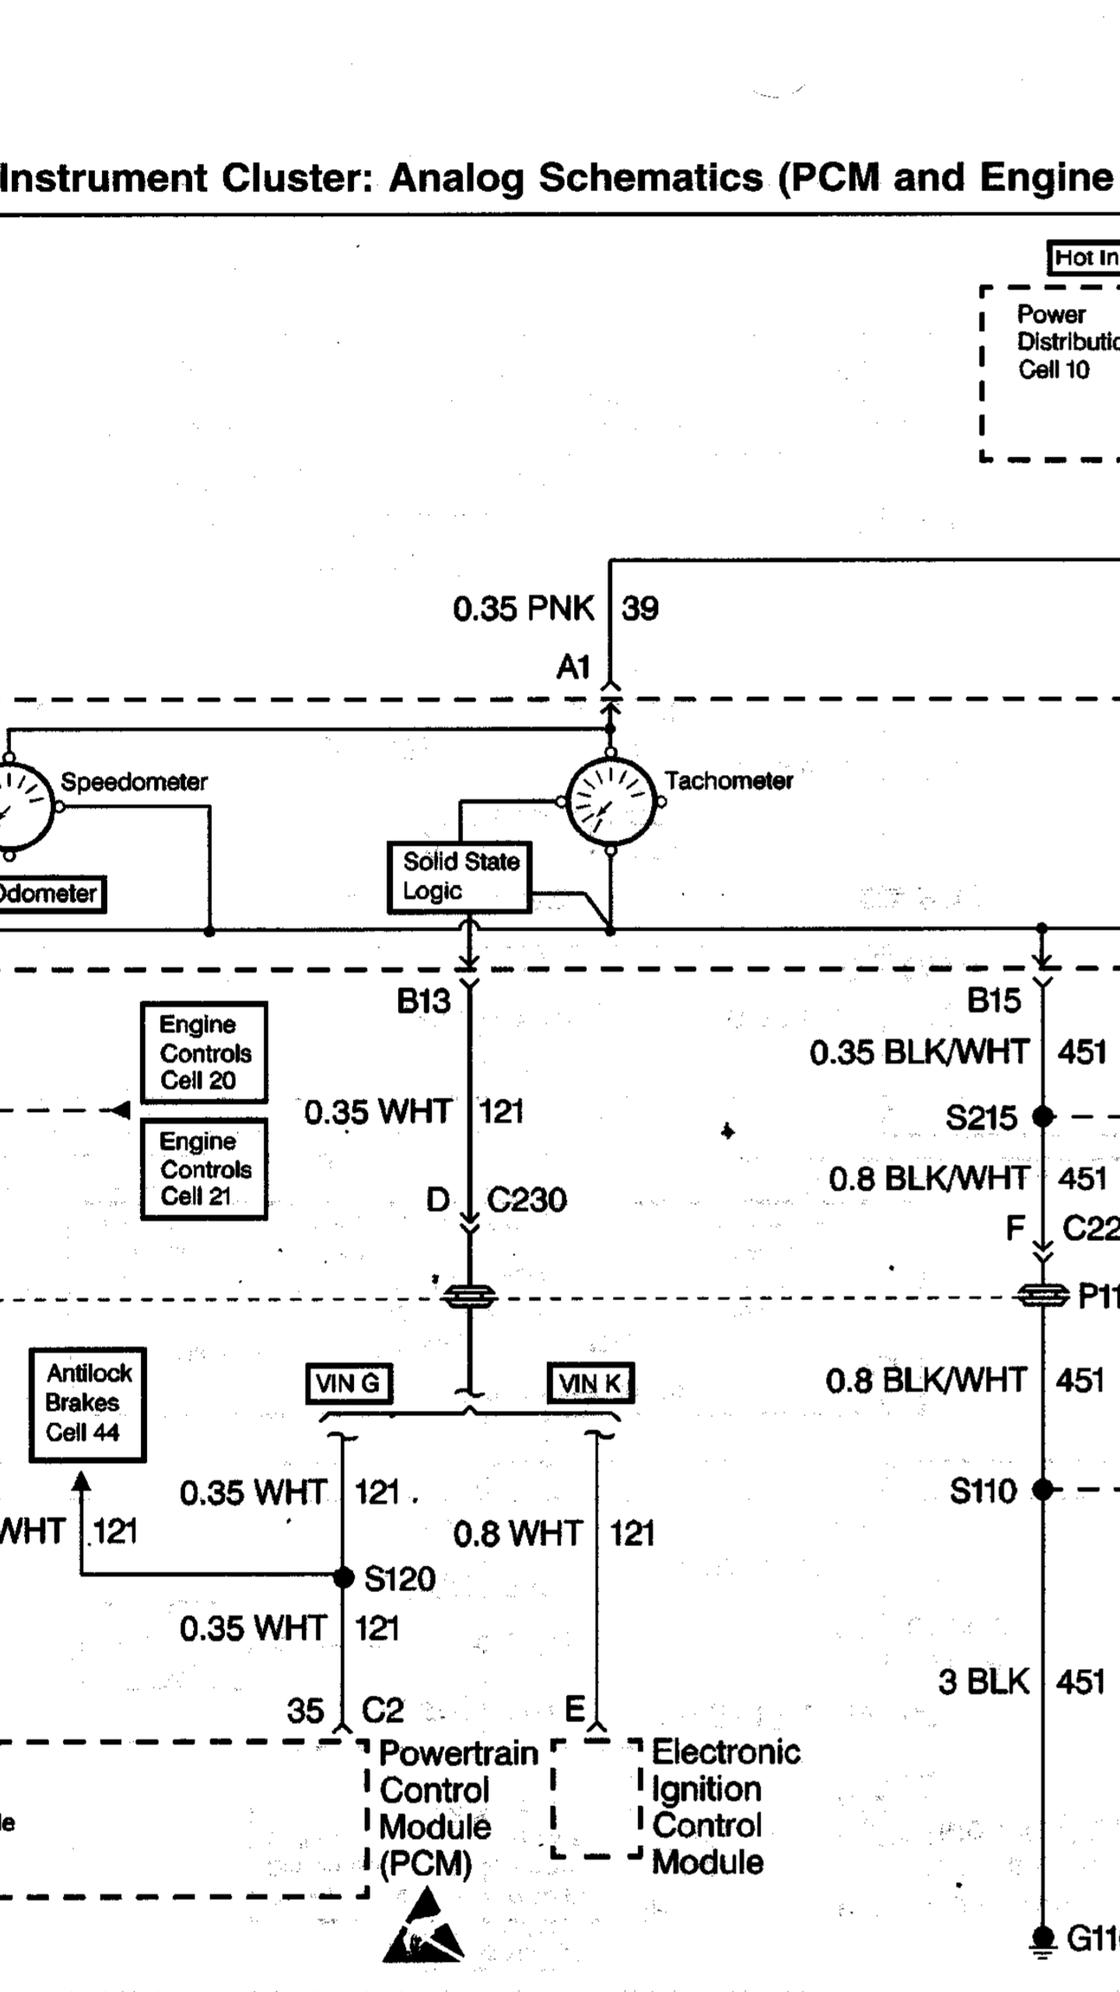 98 Camaro Sbc Swap Stock Tach Wiring - Ls1tech